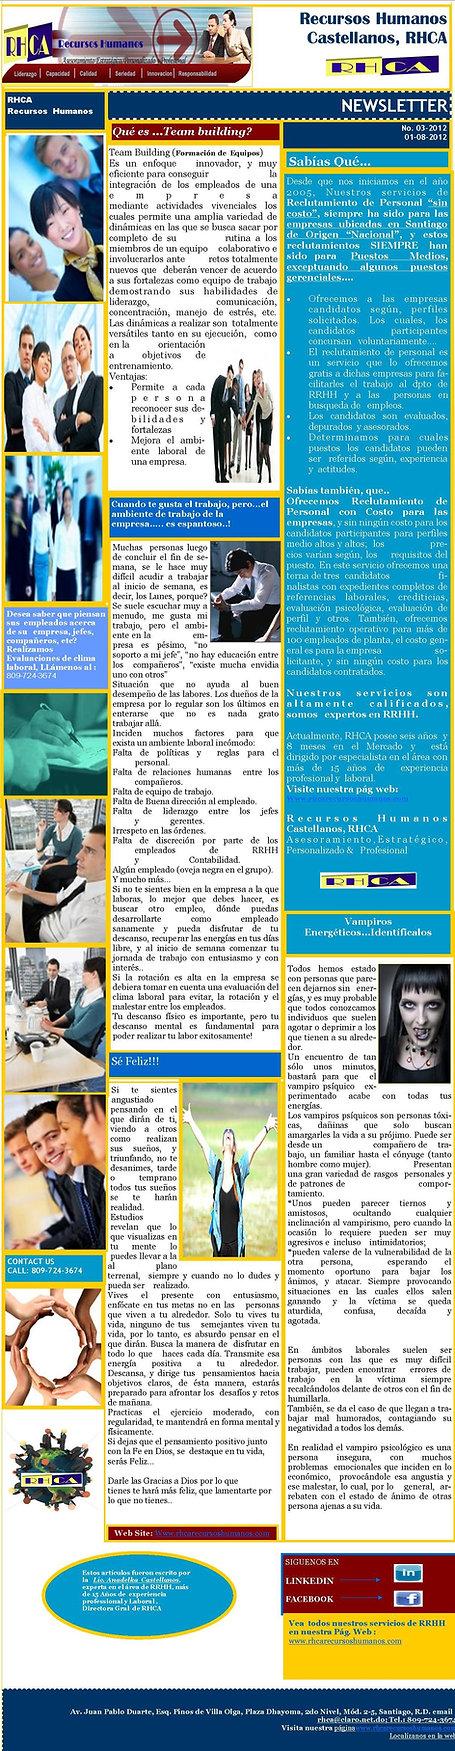 newsletter-RHCA-03-2012.jpg